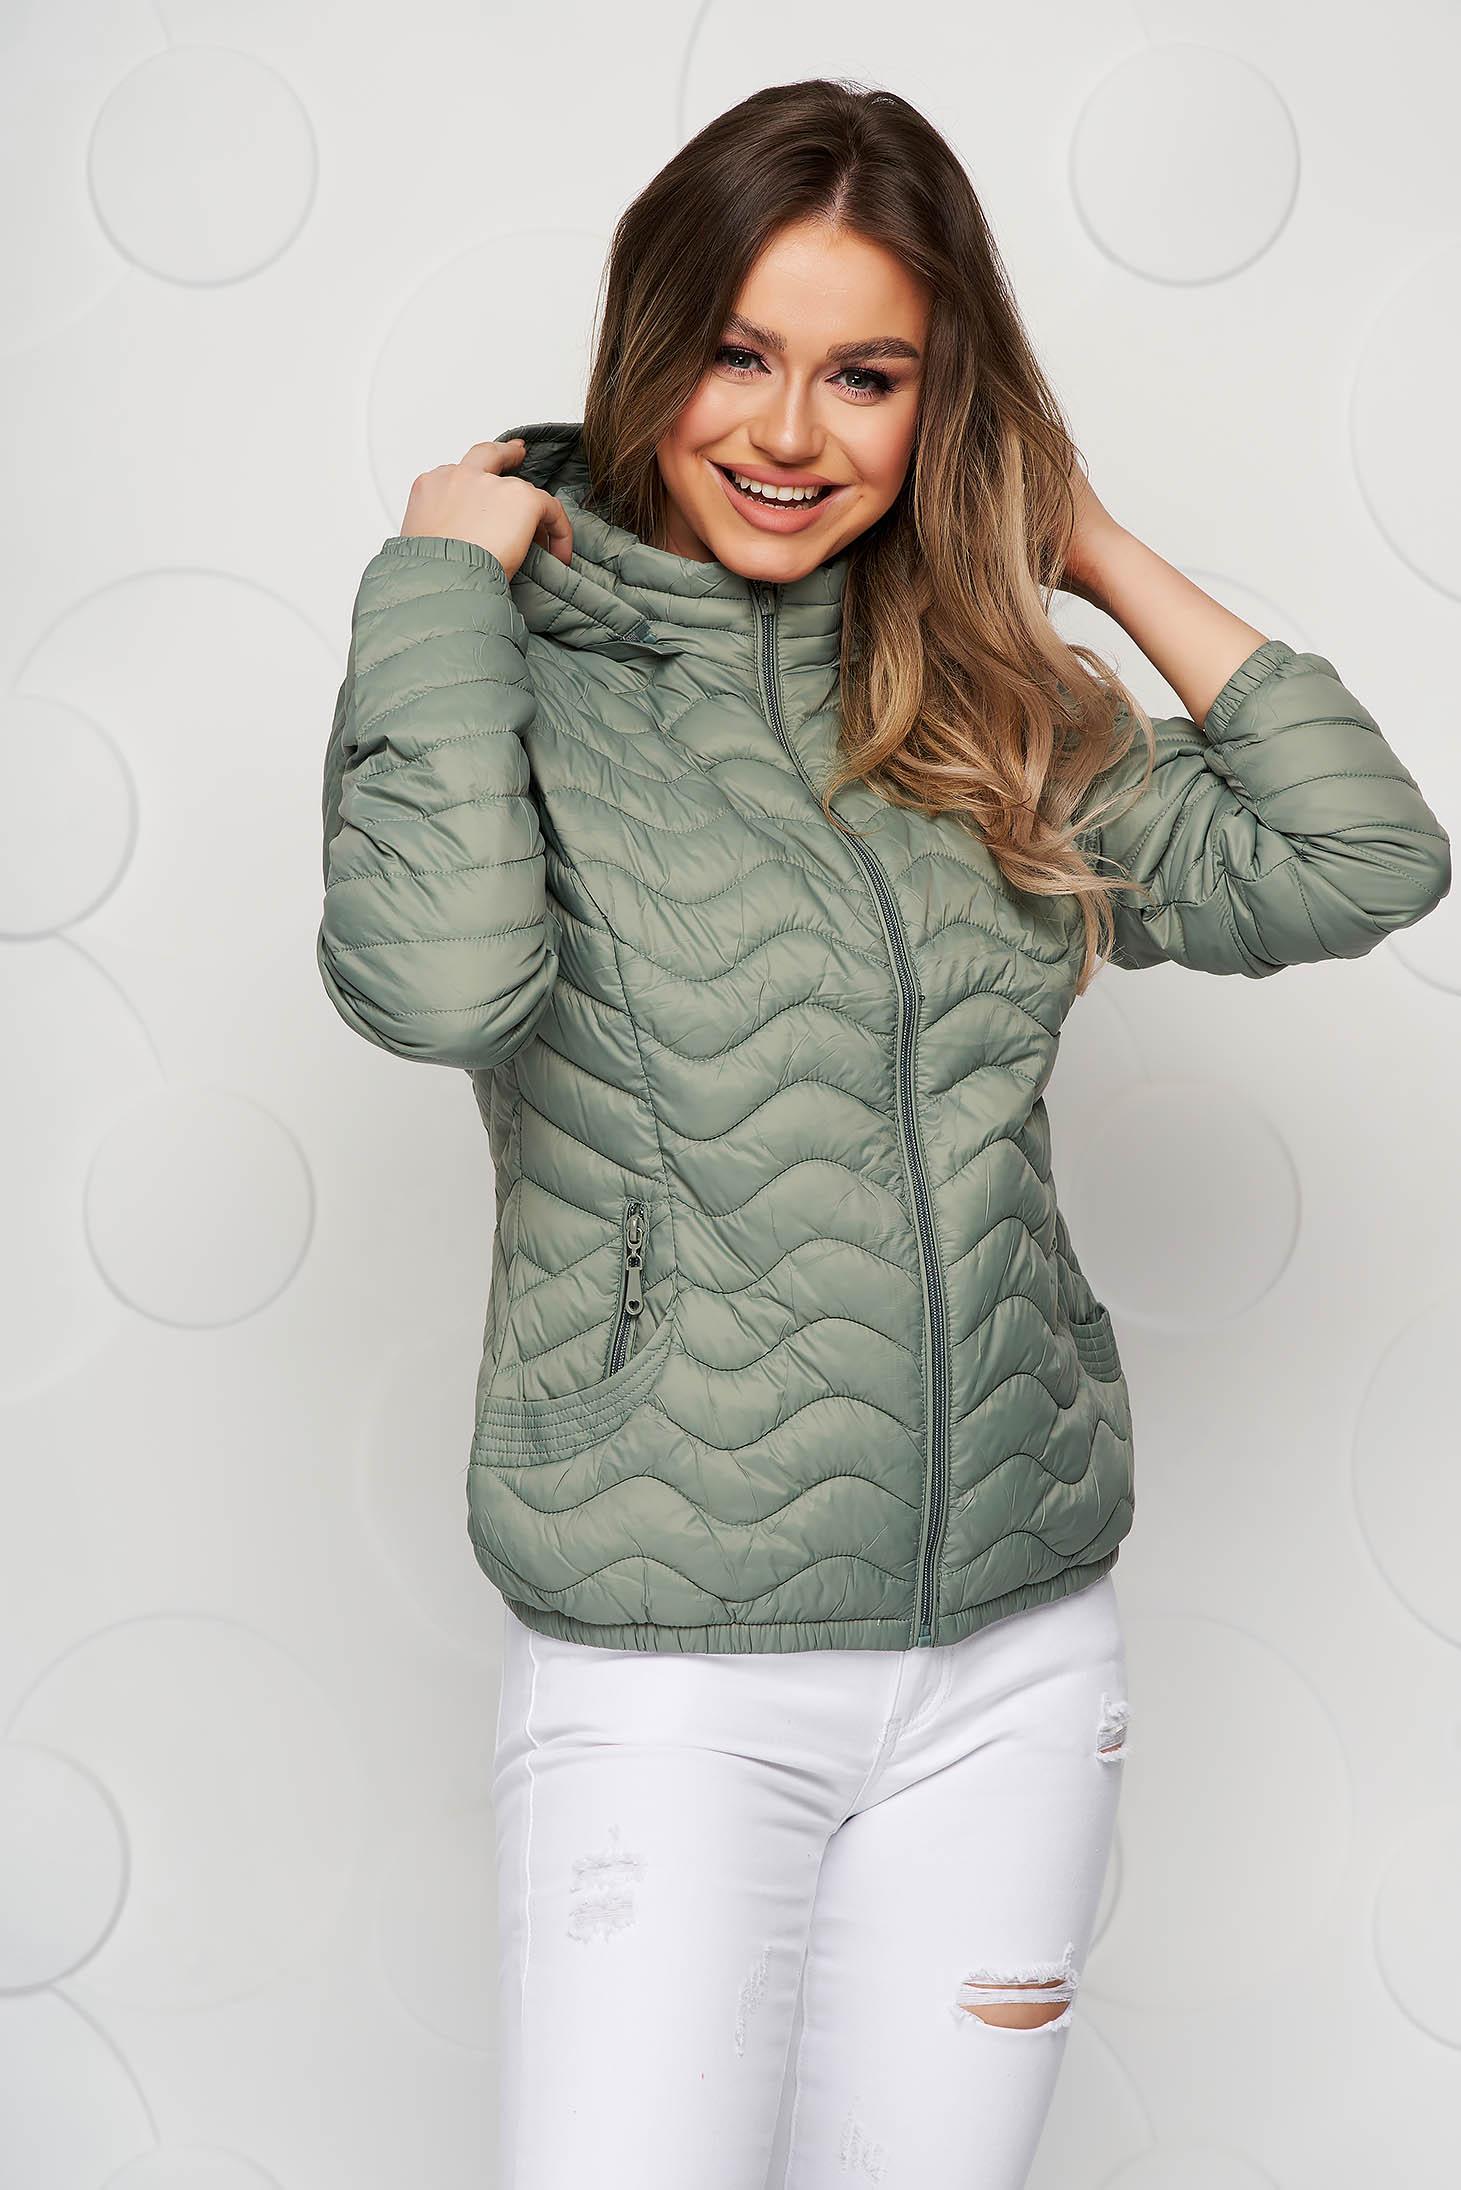 Lightgreen jacket tented from slicker thin fabric